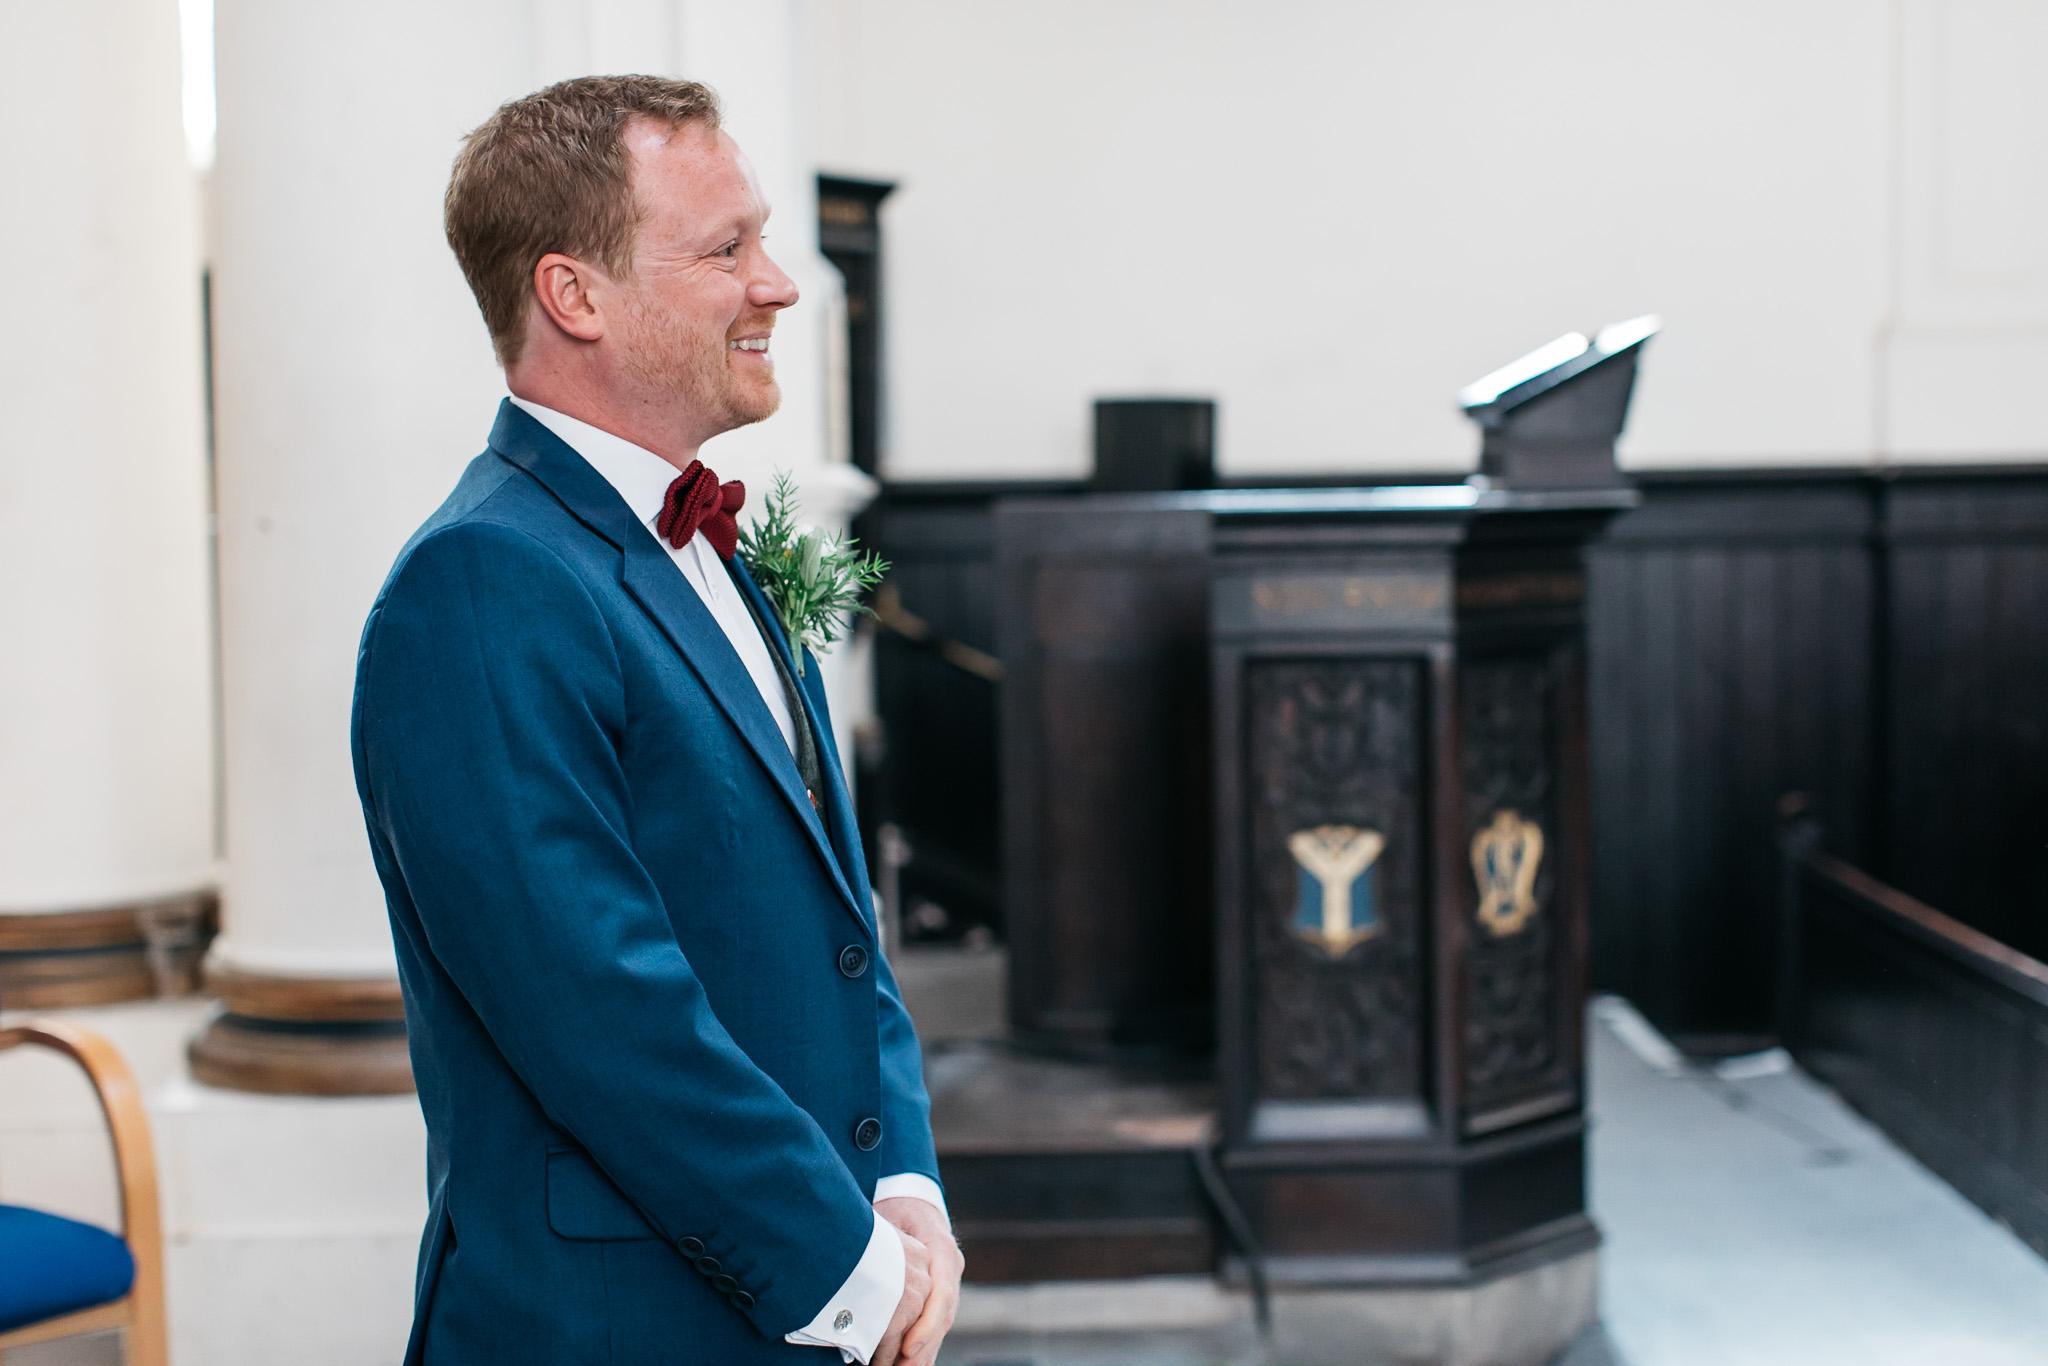 st_andrews_fabrica_brighton_wedding_549.jpg